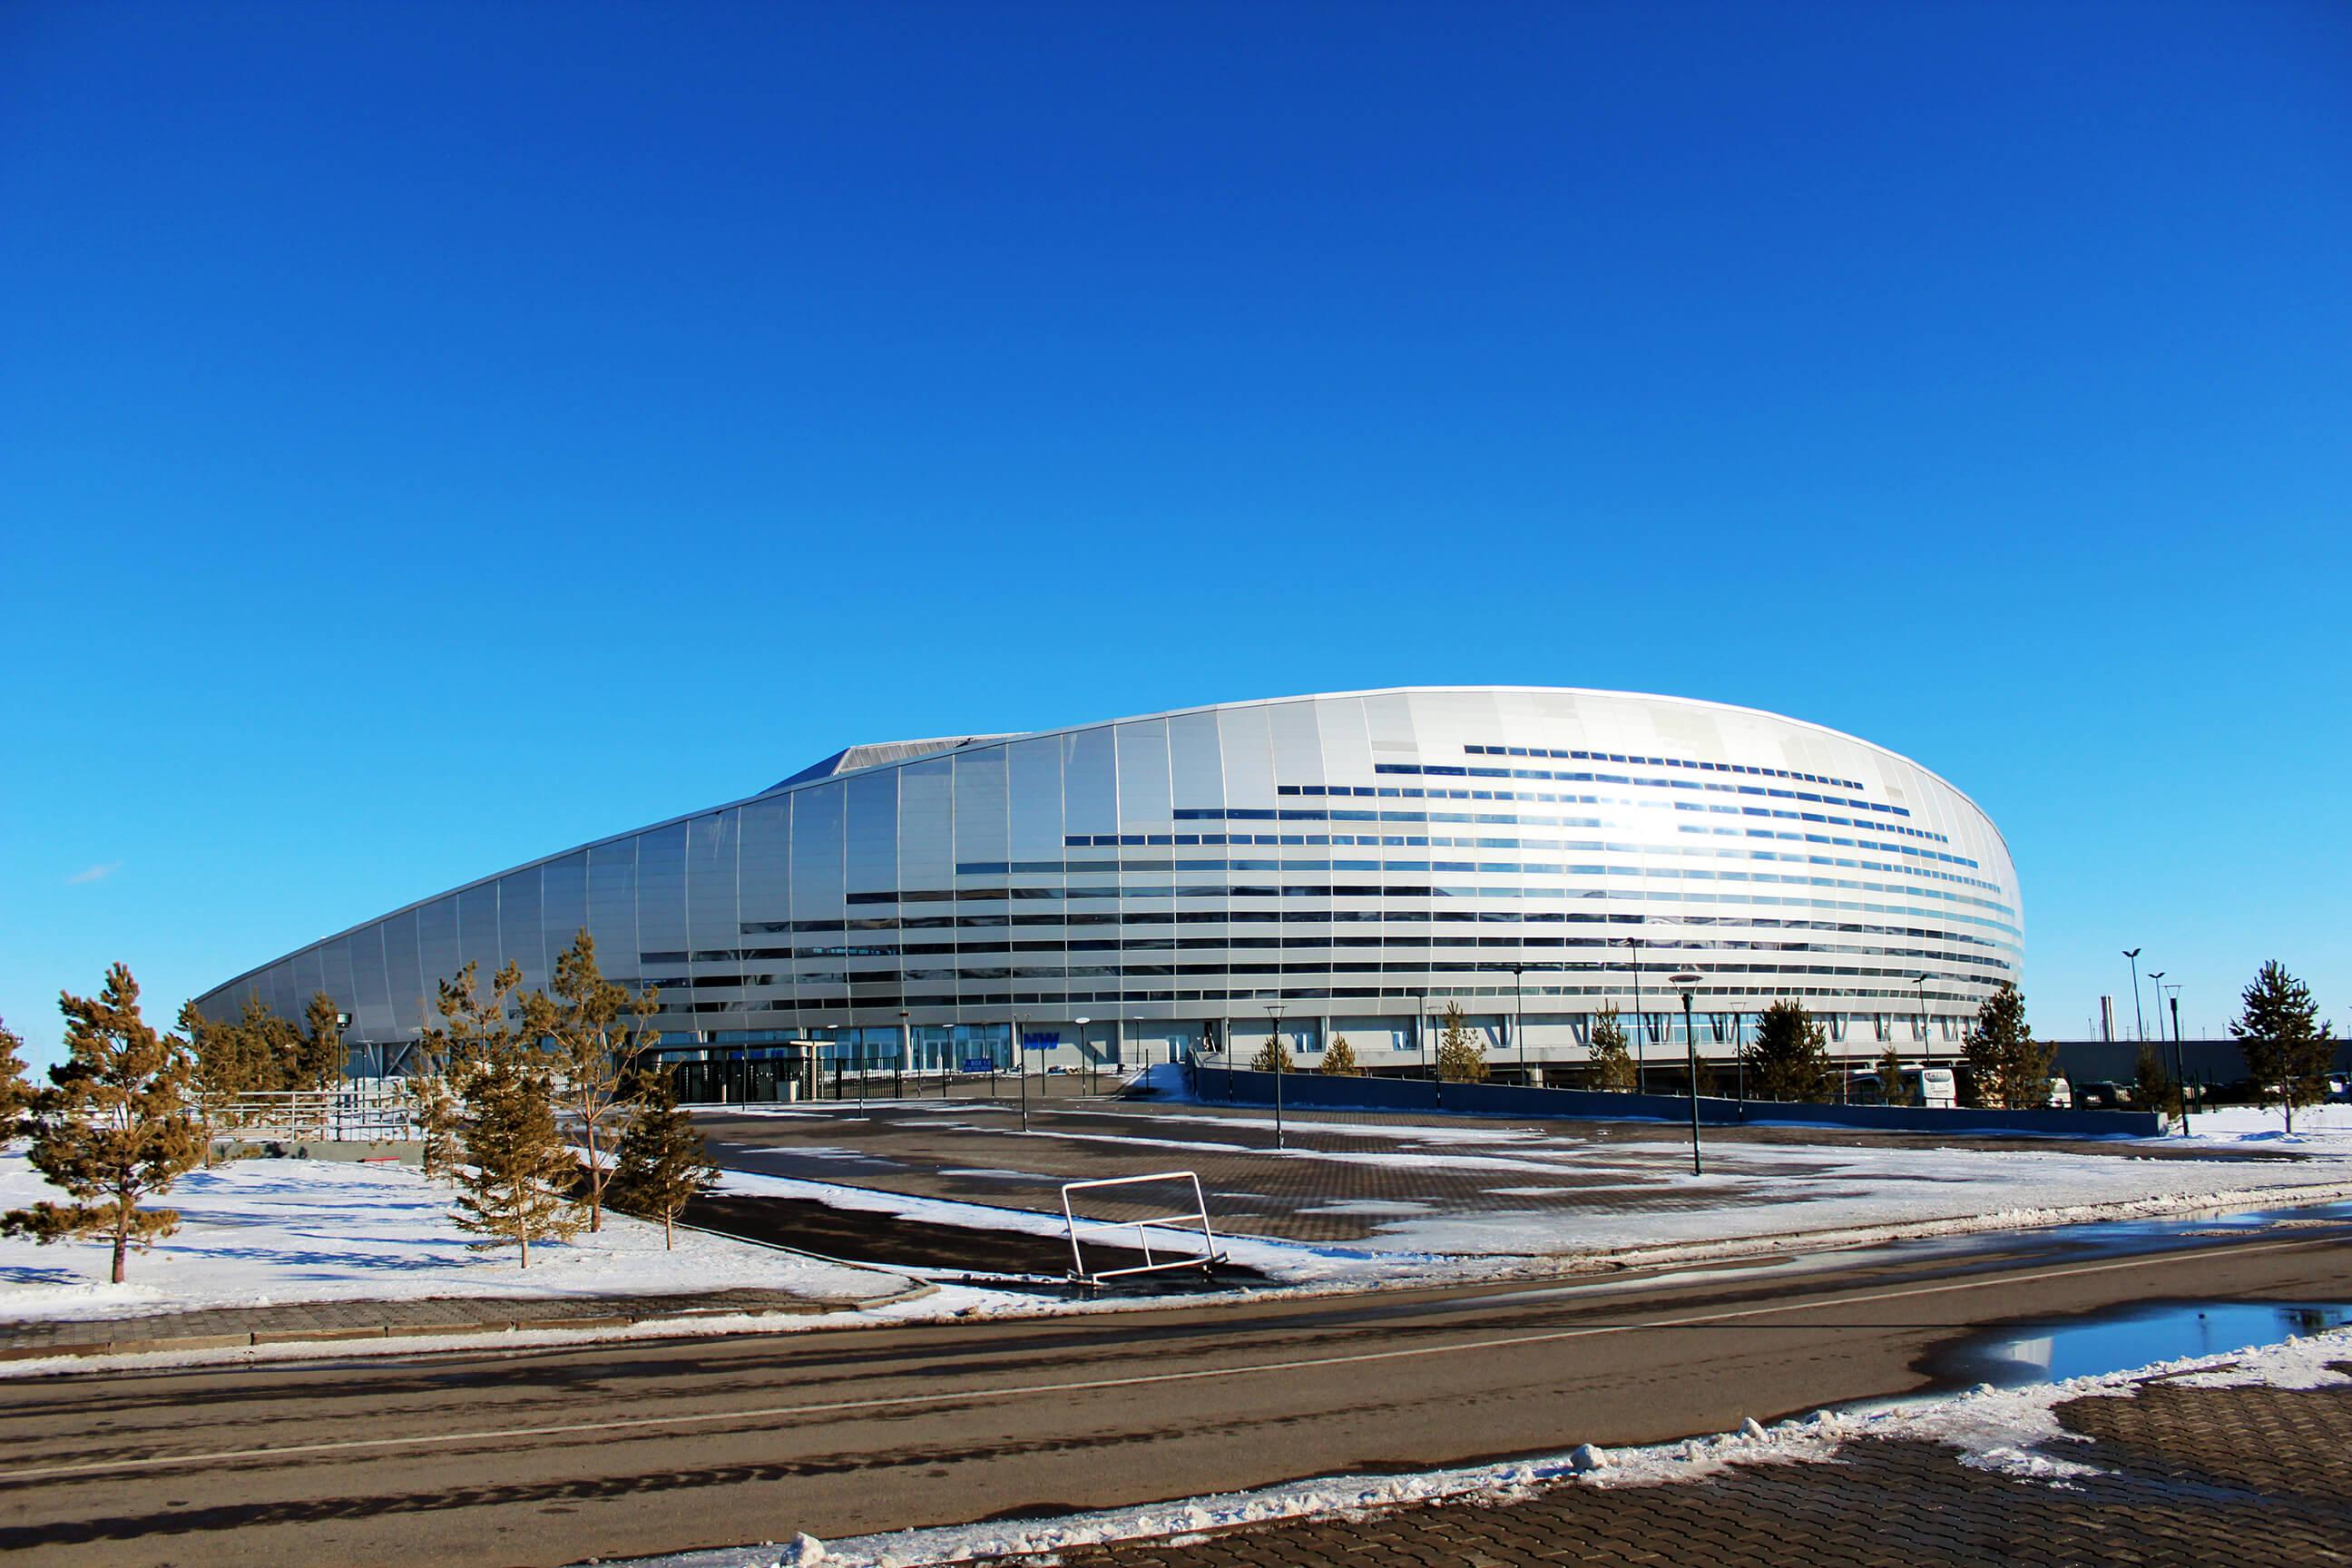 HyCOMB's aluminium honeycomb panels used for exterior cladding at Astana Area; Khazakstan's national football stadium.